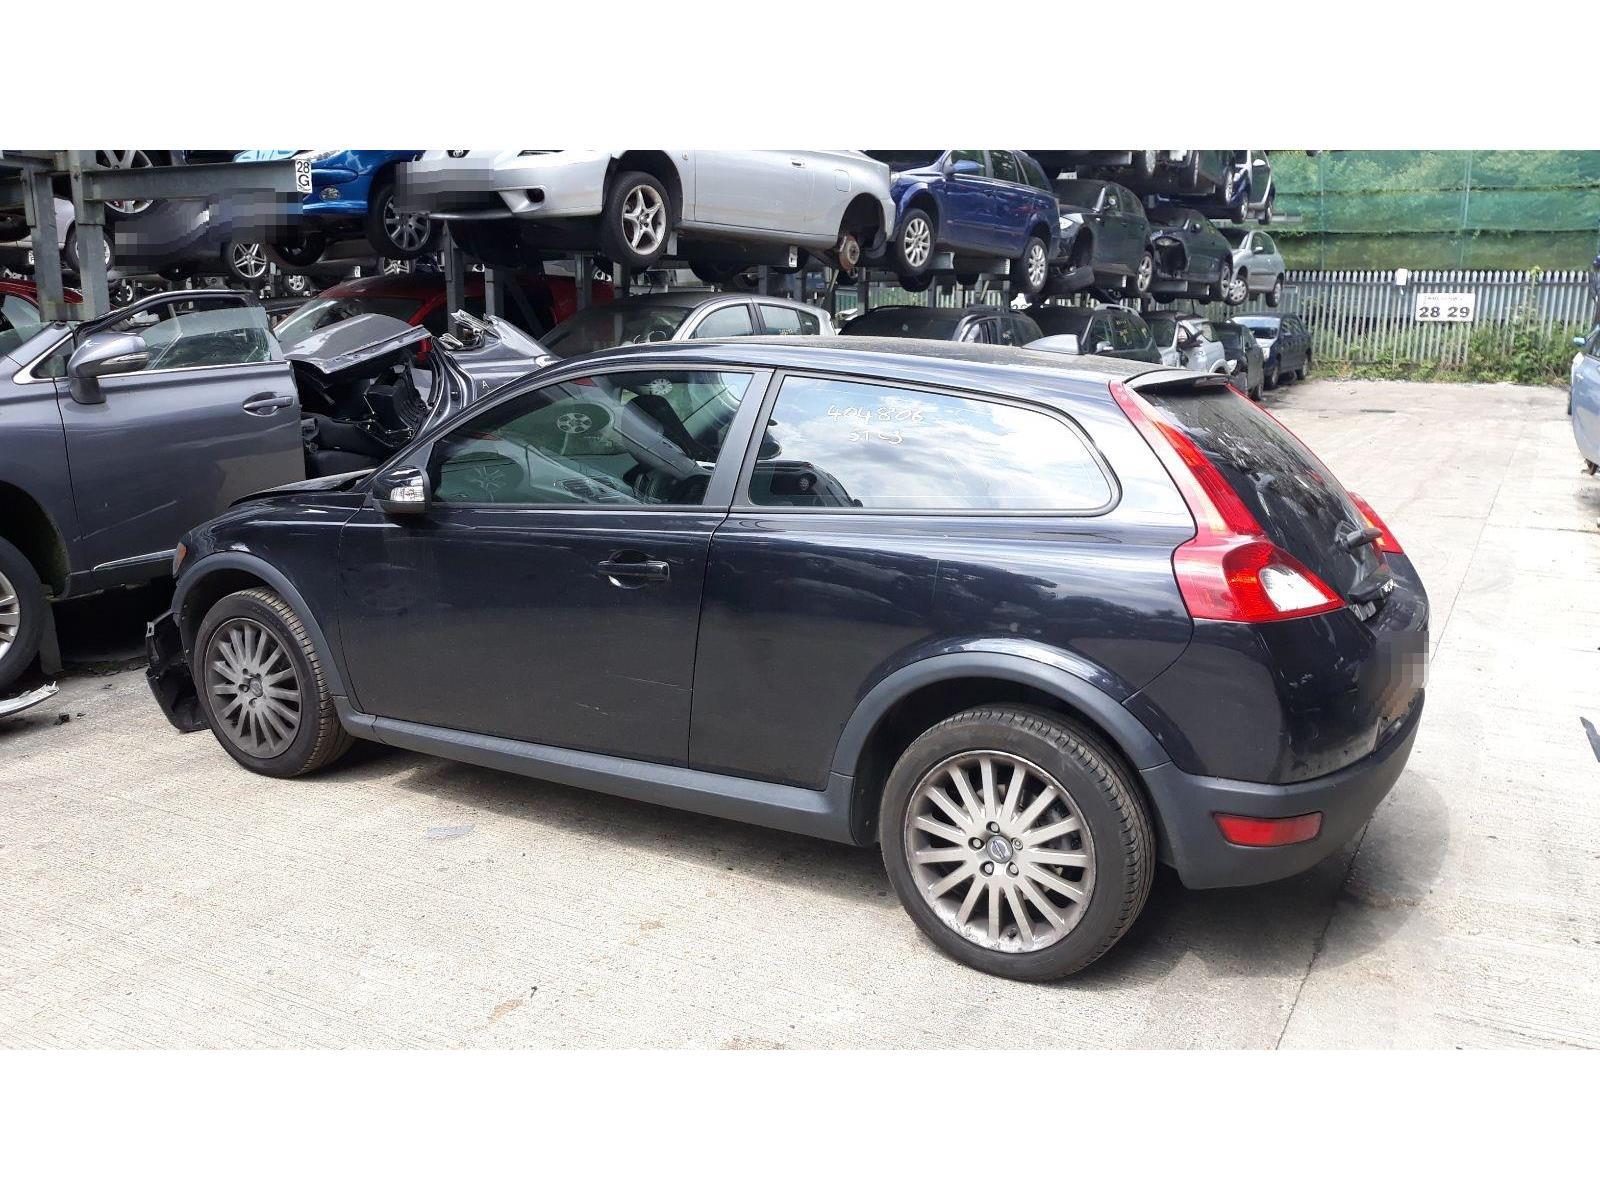 Volvo C30 2007 To 2009 Se Lux 3 Door Coupe Scrap Salvage Car For Fuse Box Sale Auction Silverlake Autoparts